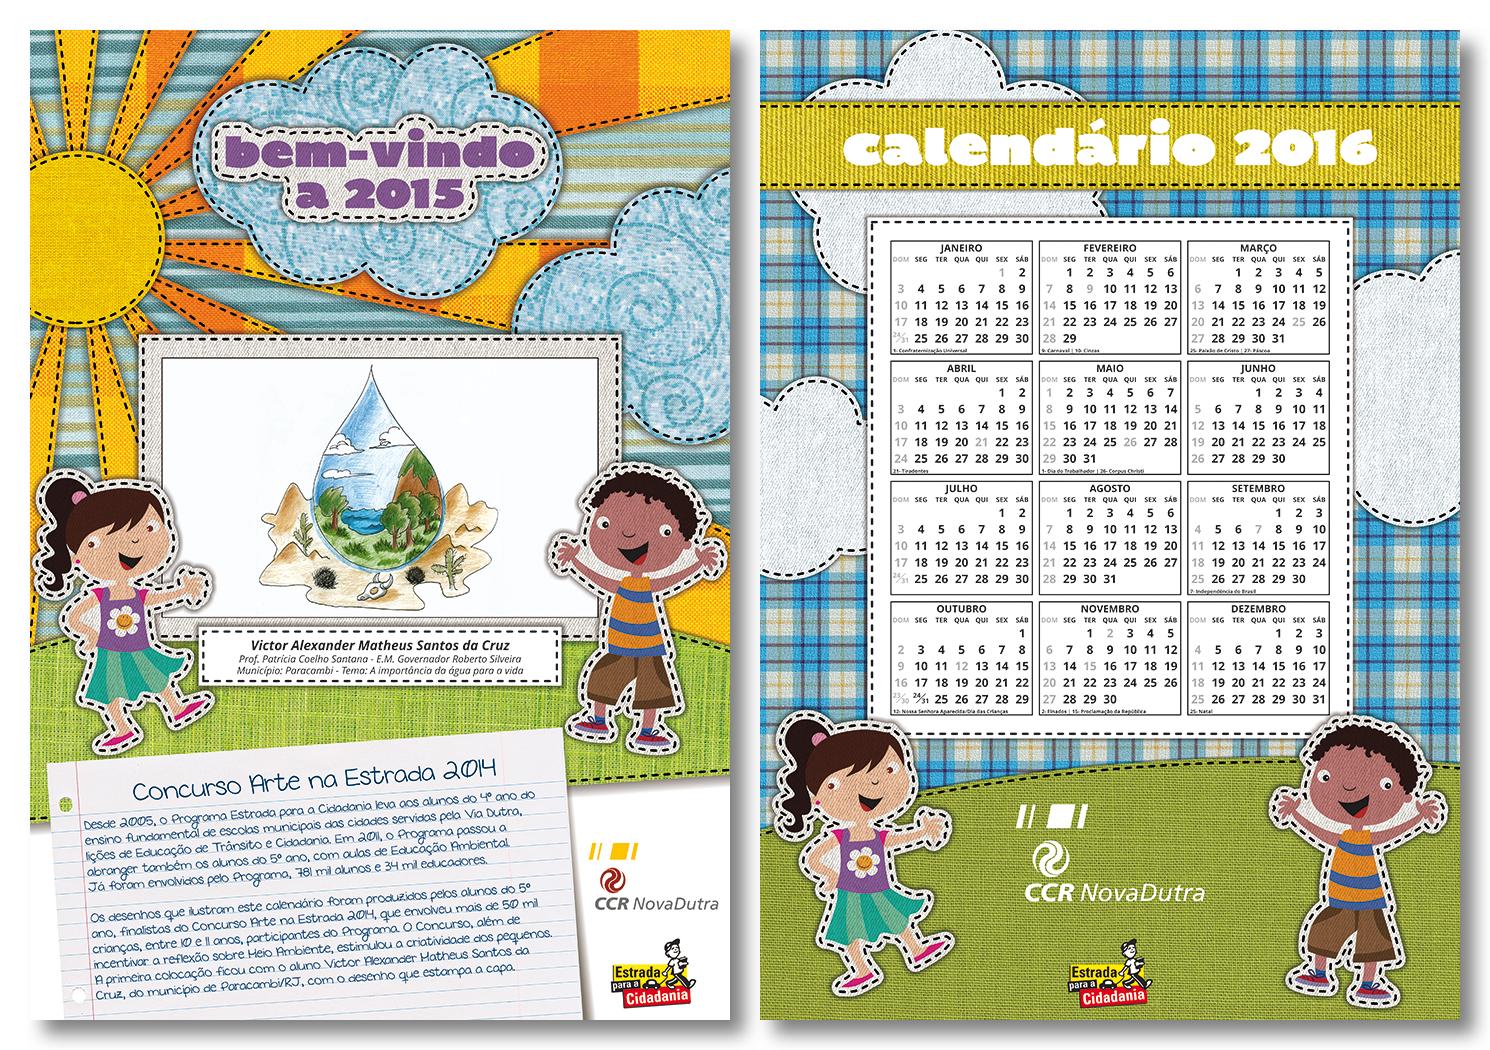 CCR NovaDutra 2015 Calendar (1/7) by LGRuffa